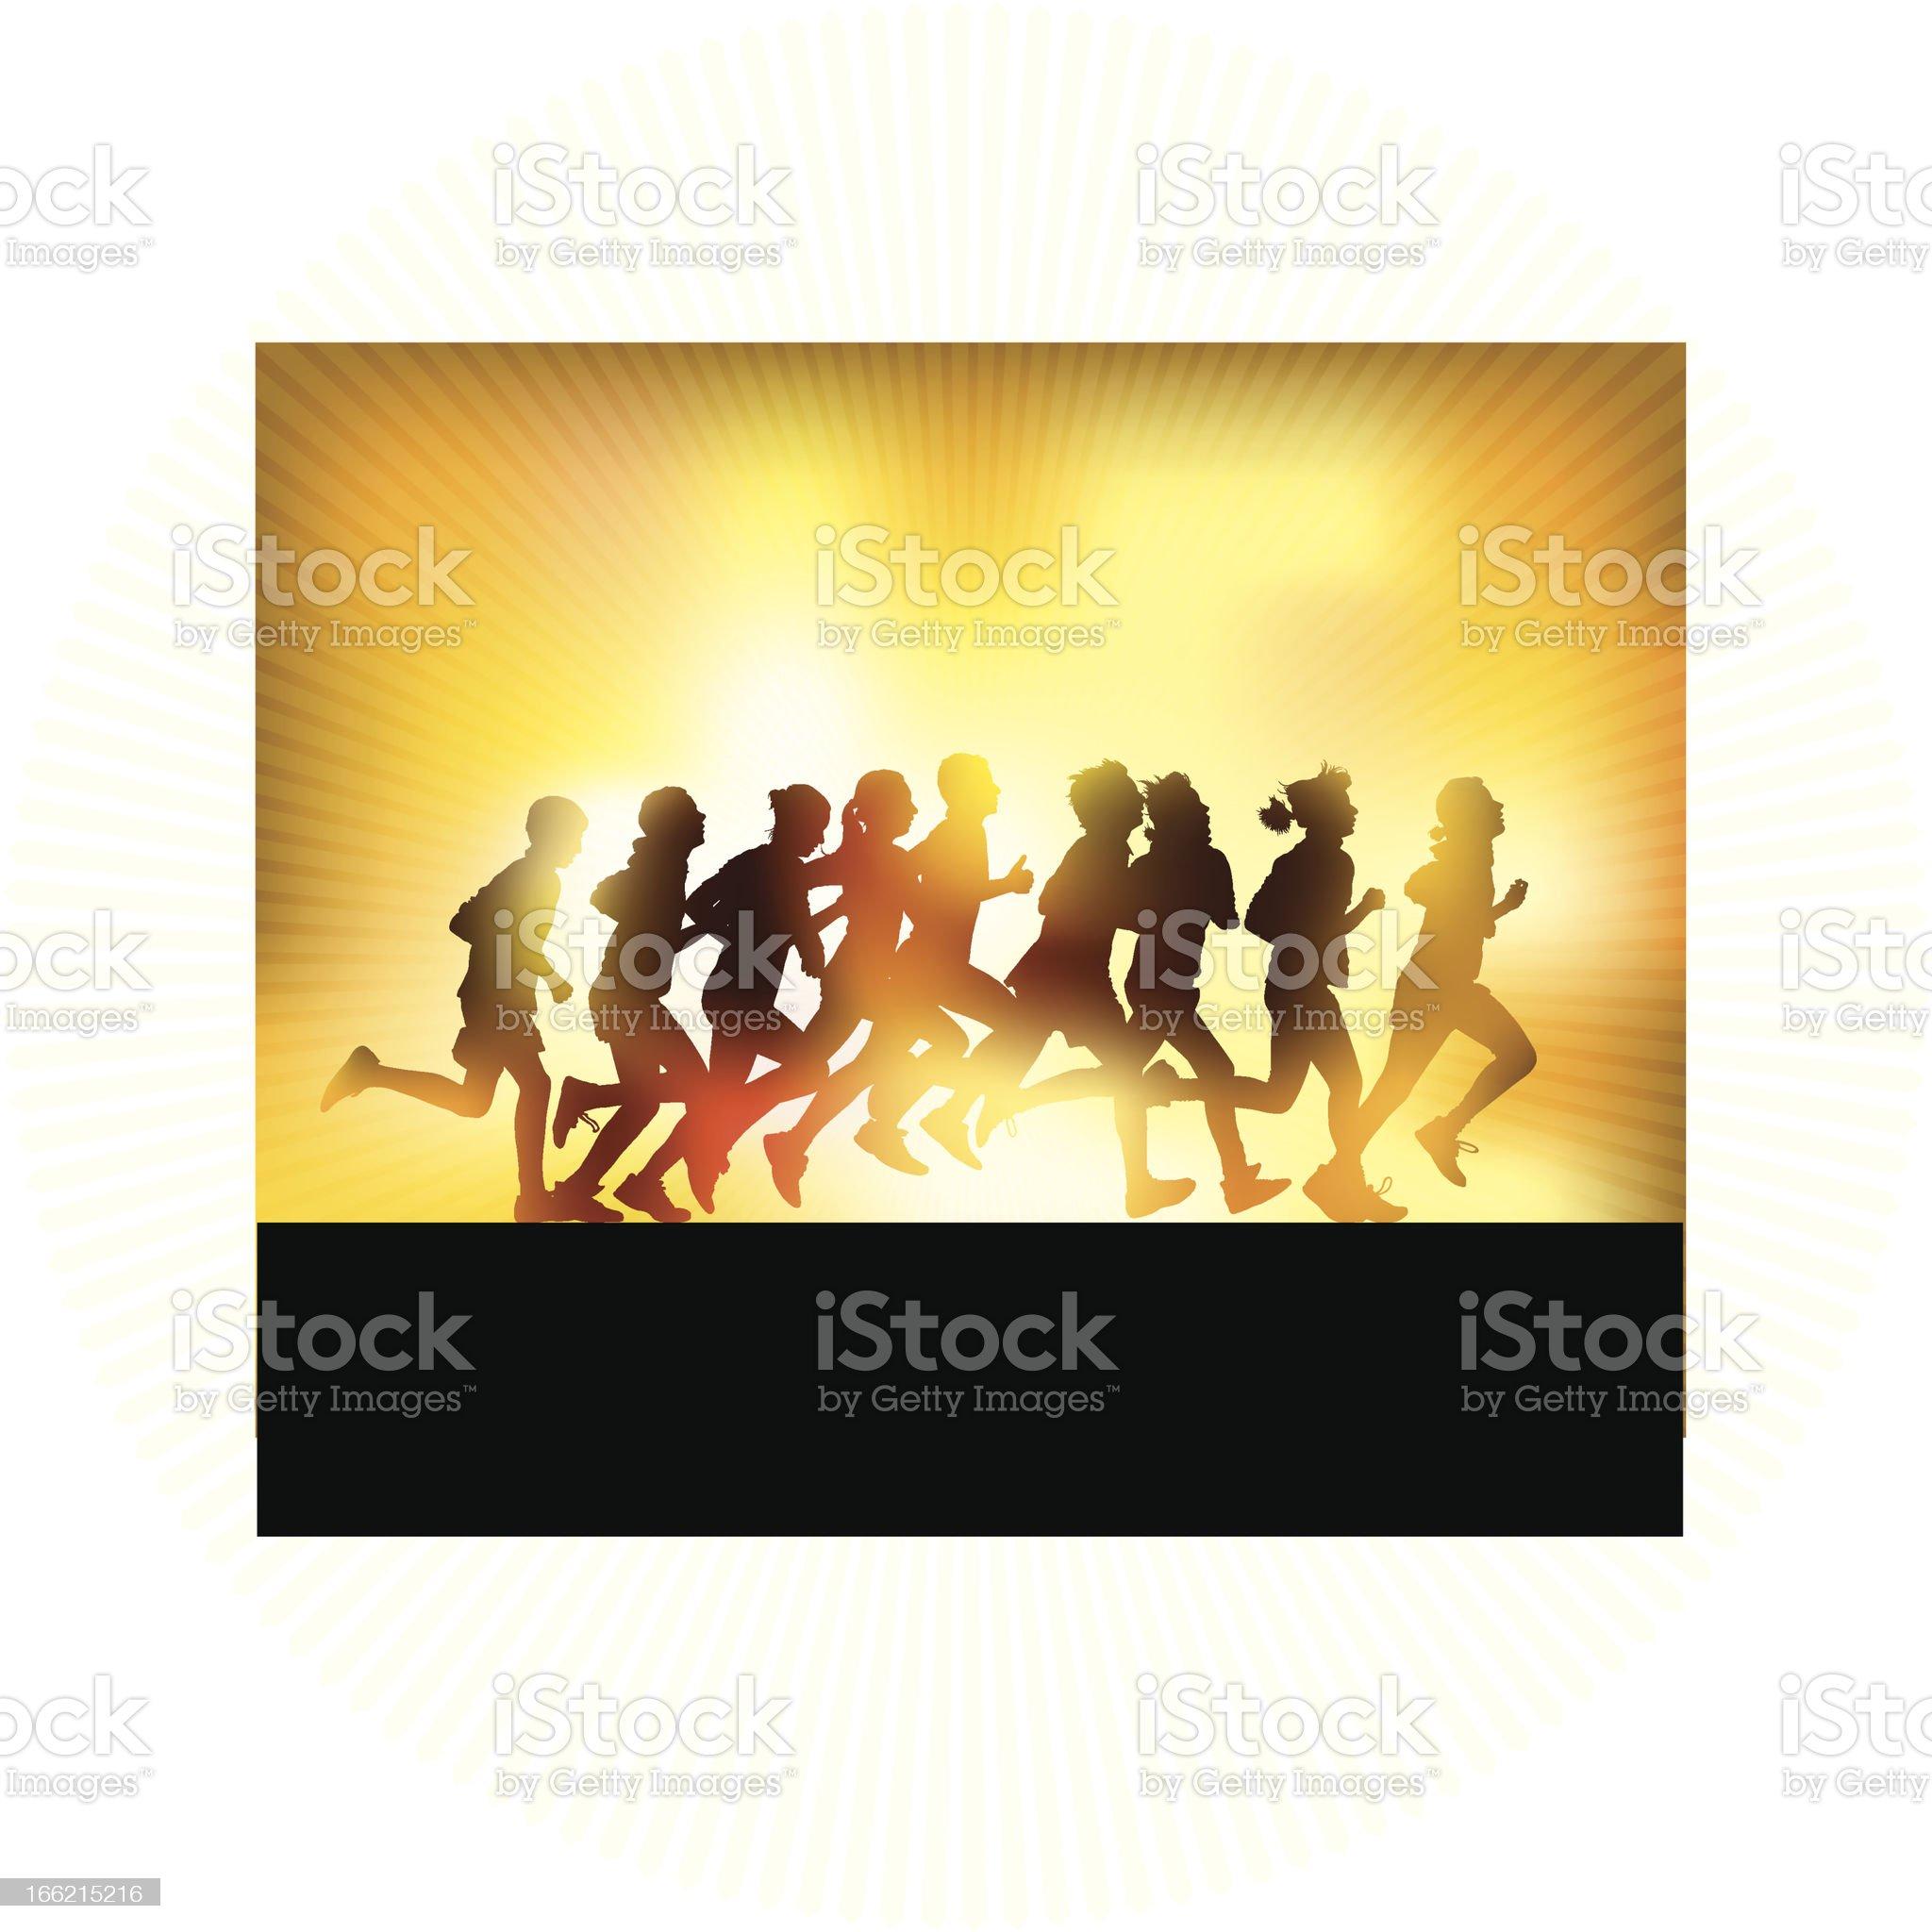 Running people royalty-free stock vector art